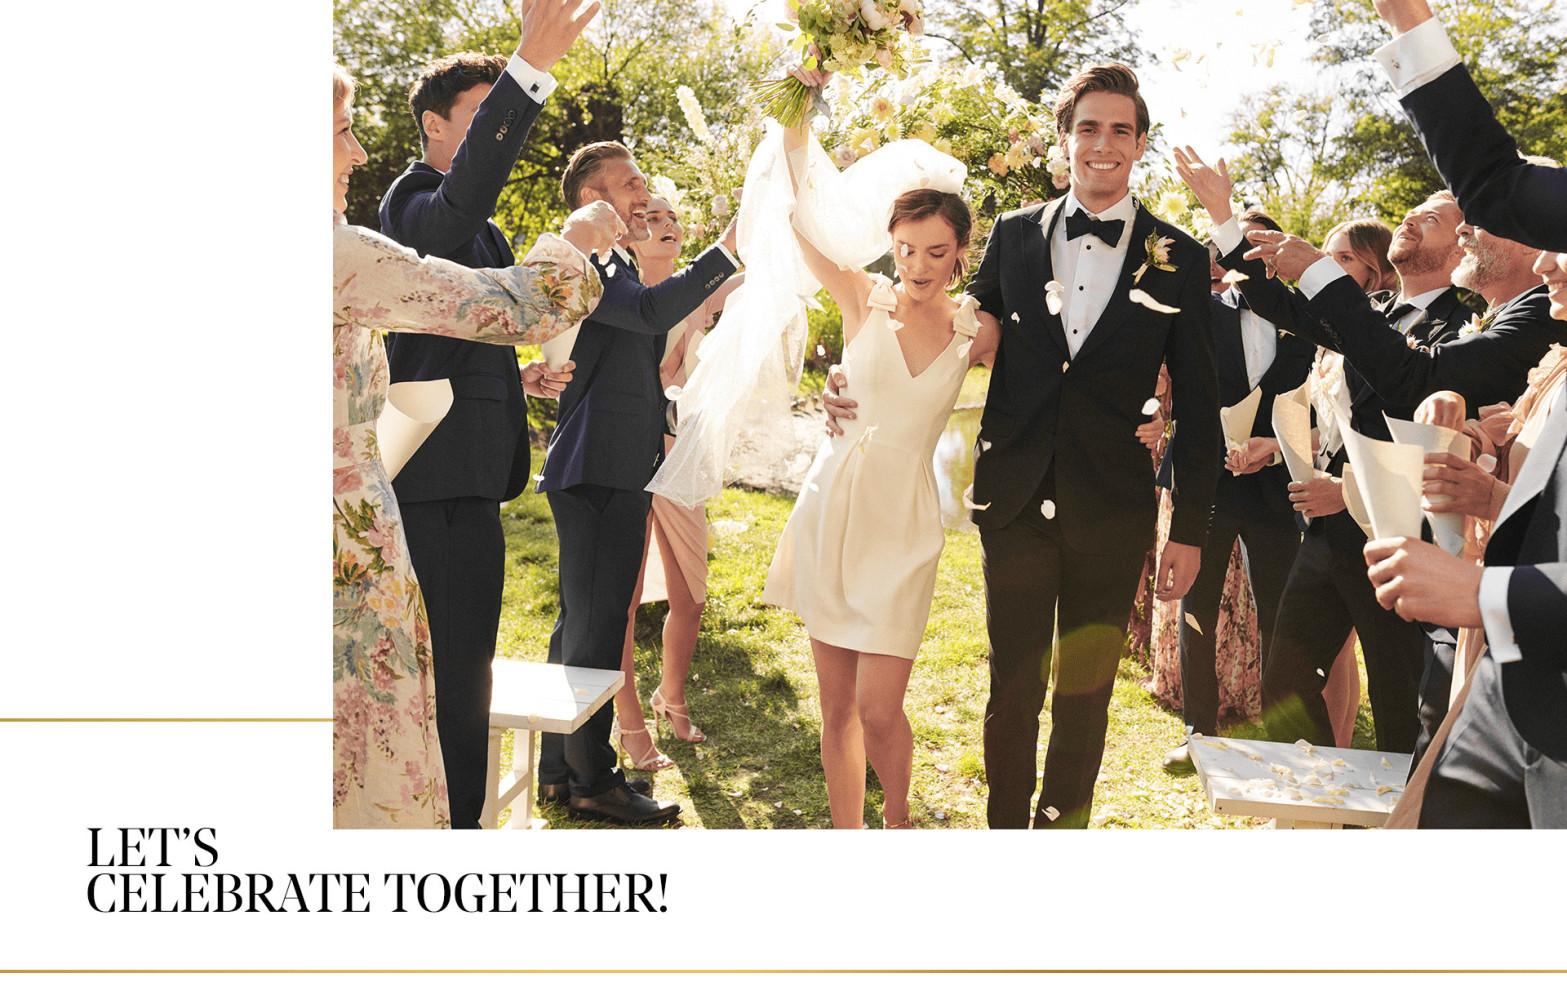 PETER JOHANSEN @VISTULA WEDDING CELEBRATION